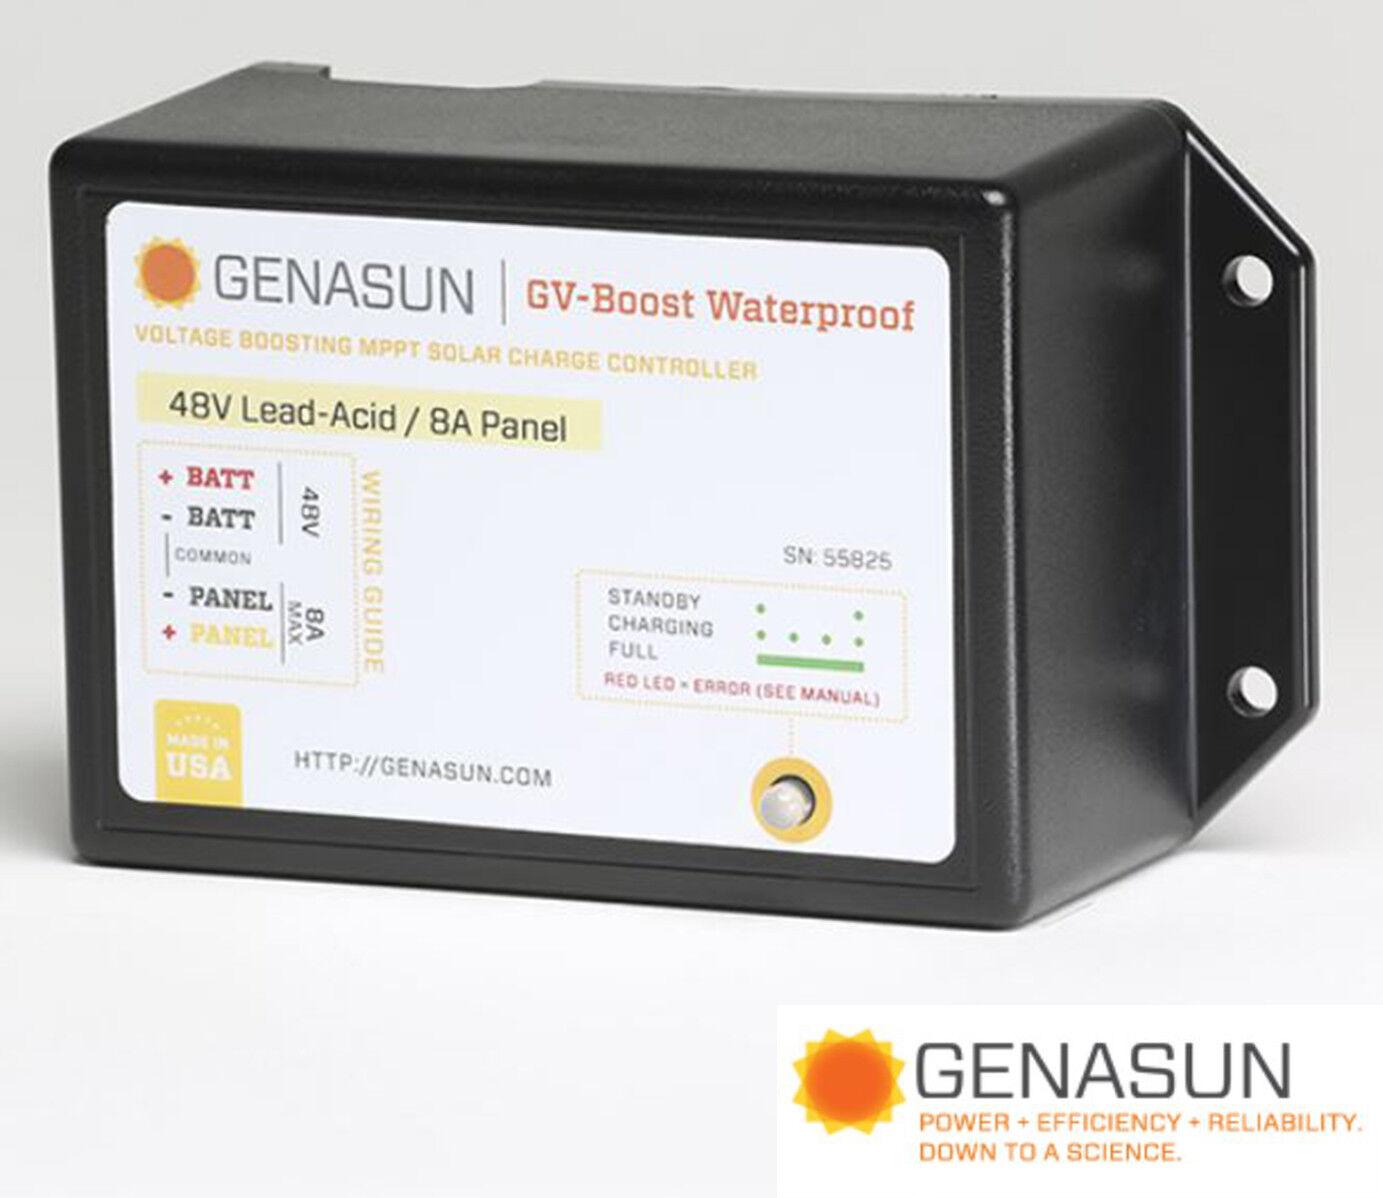 GENASUN GVB-8-PB-48V-WP MPPT CHARGE CONTROL VOLTAGE BOOST 48 VDC 8A WATERPROOF